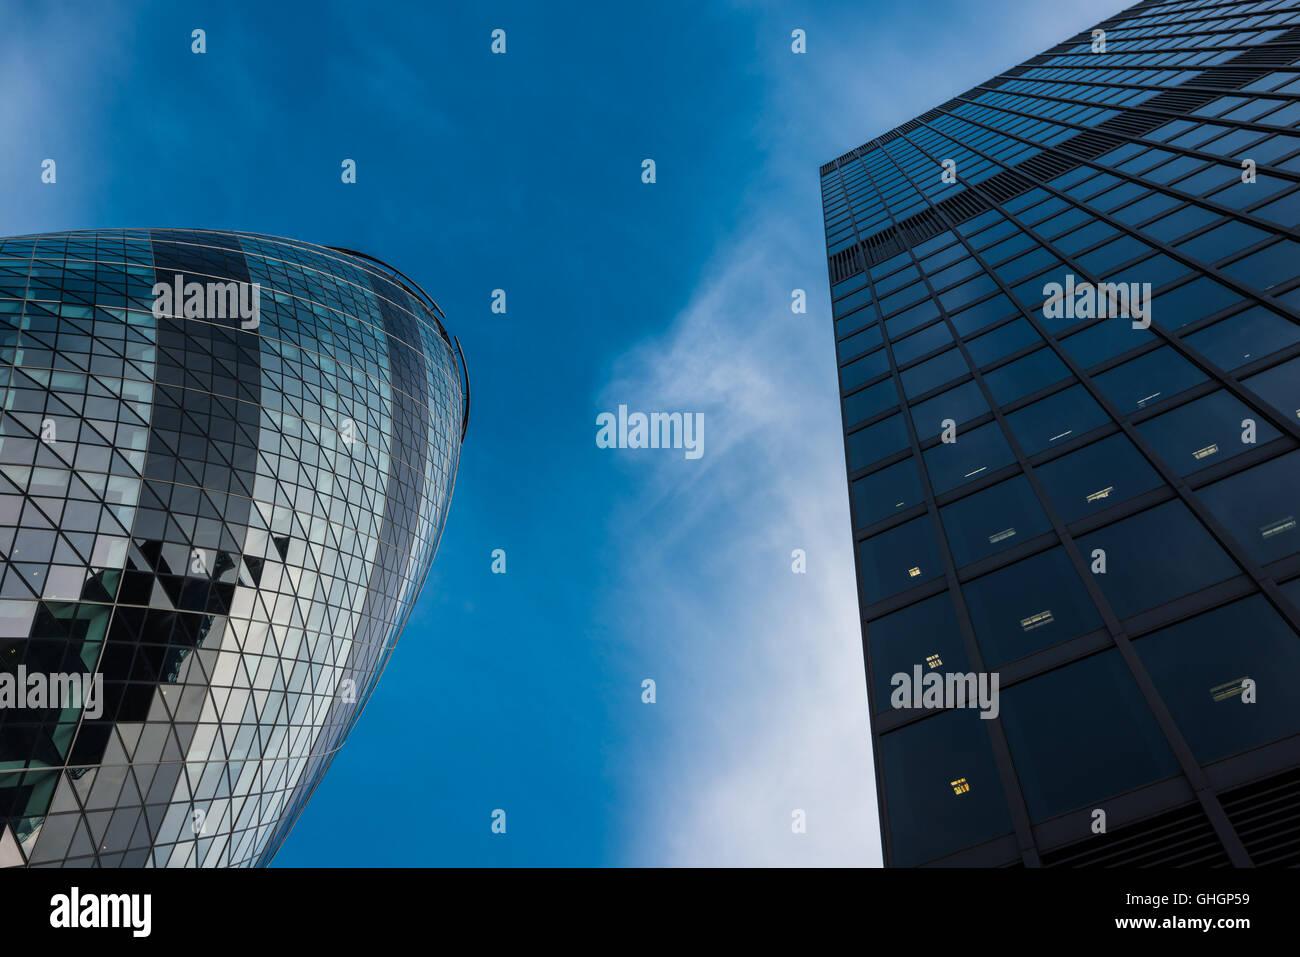 Le Gherkin office building, City of London, Londres, Royaume-Uni Photo Stock